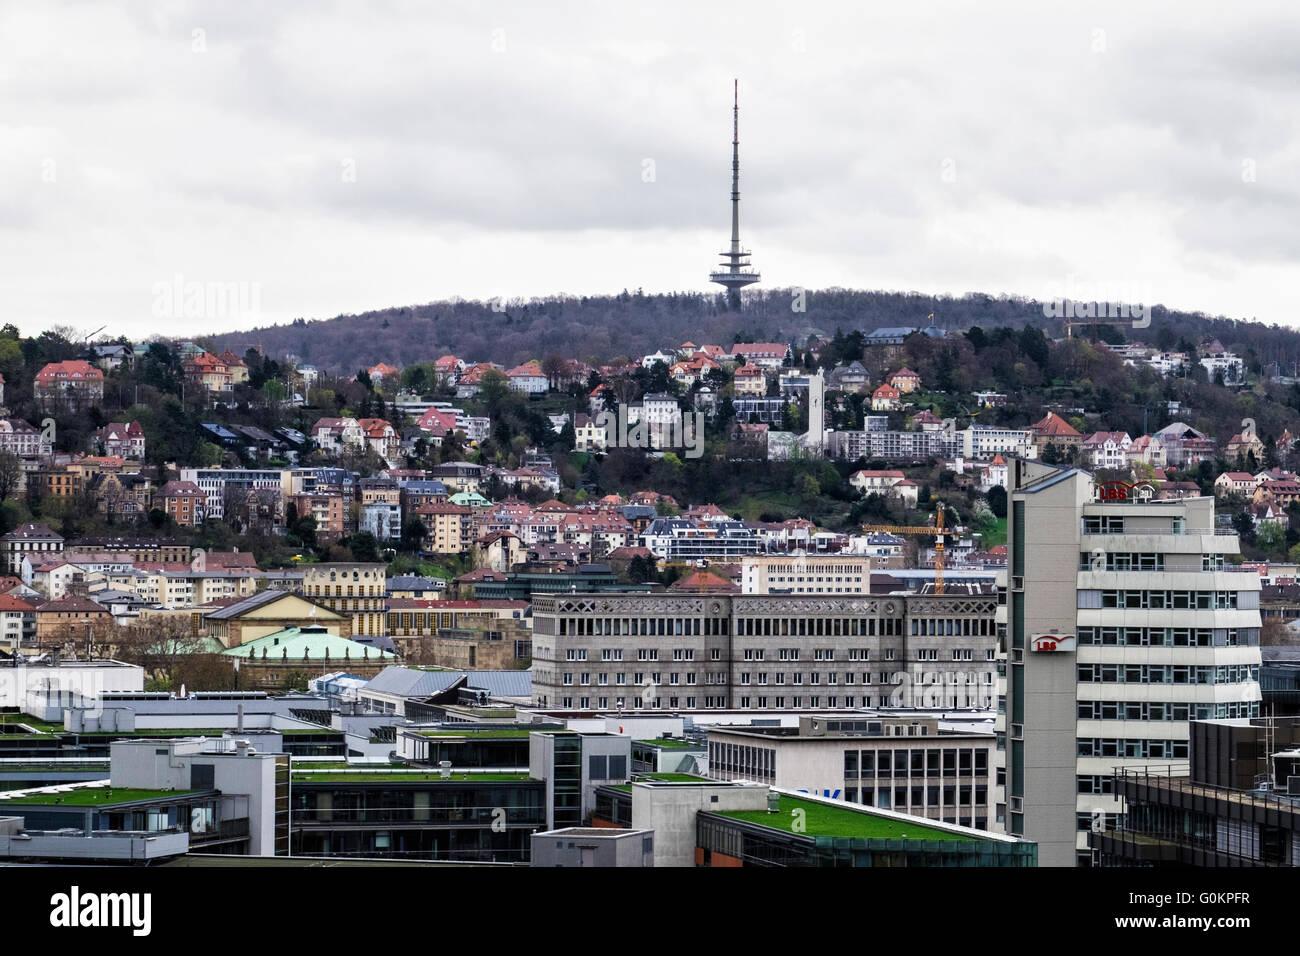 Stuttgart, Germany. Rooftop aerial view of city buildings - Stock Image